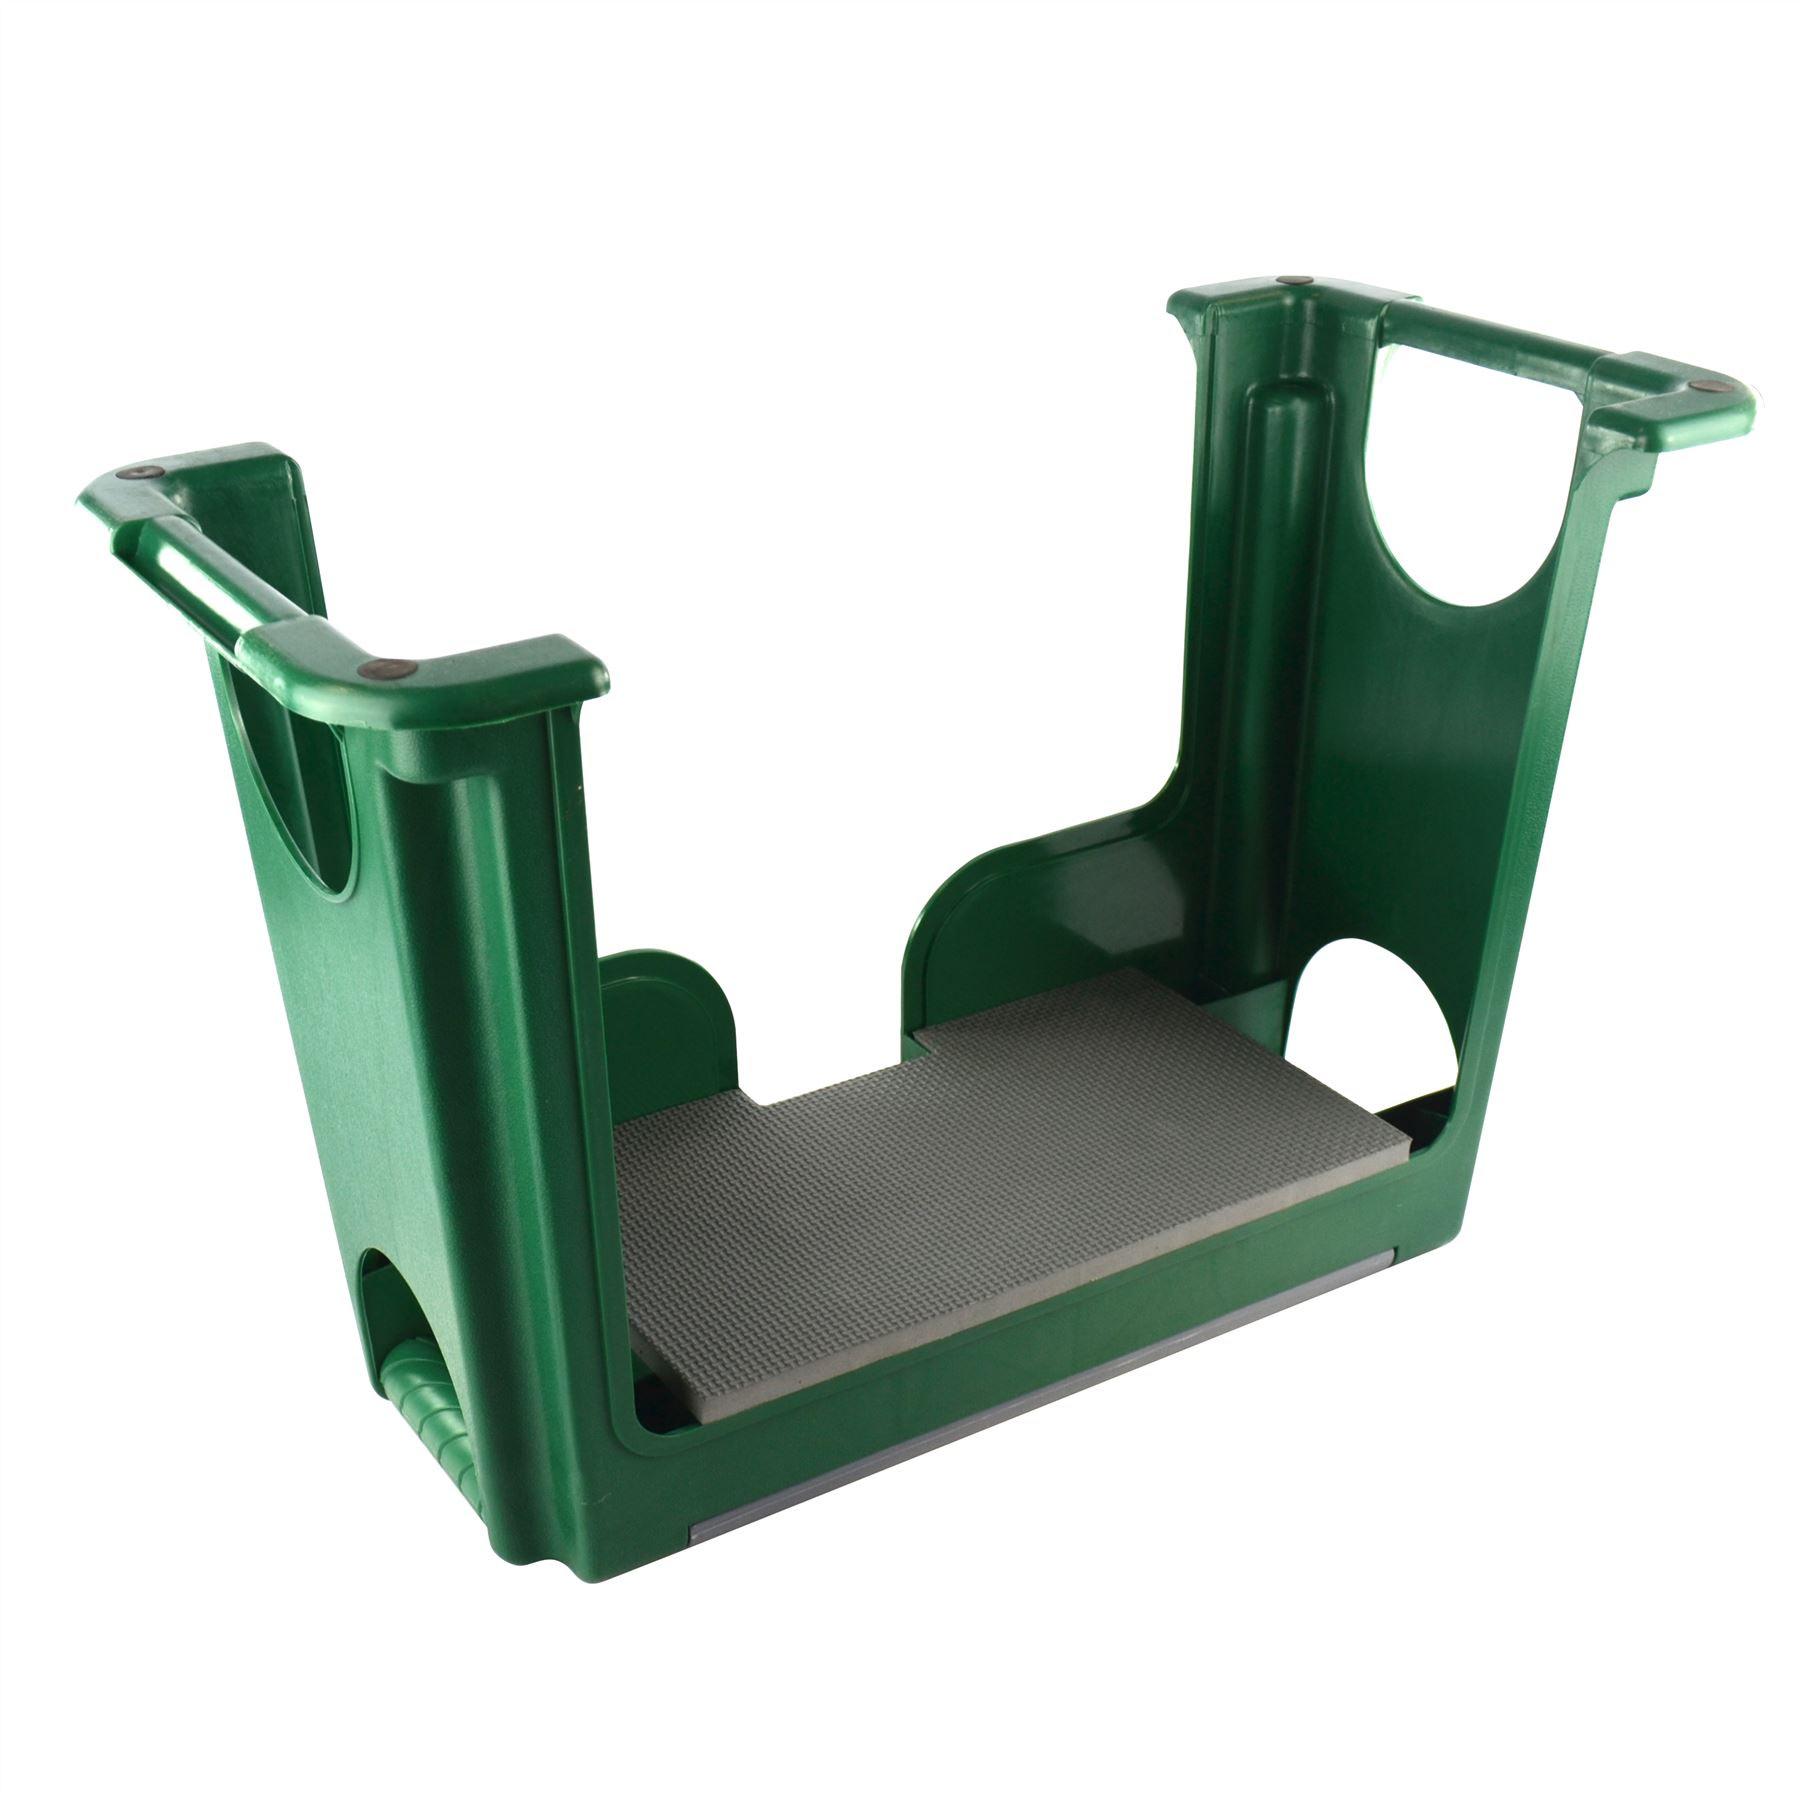 Portable Plastic Garden Kneeler Foam Chair Padded Storage ...